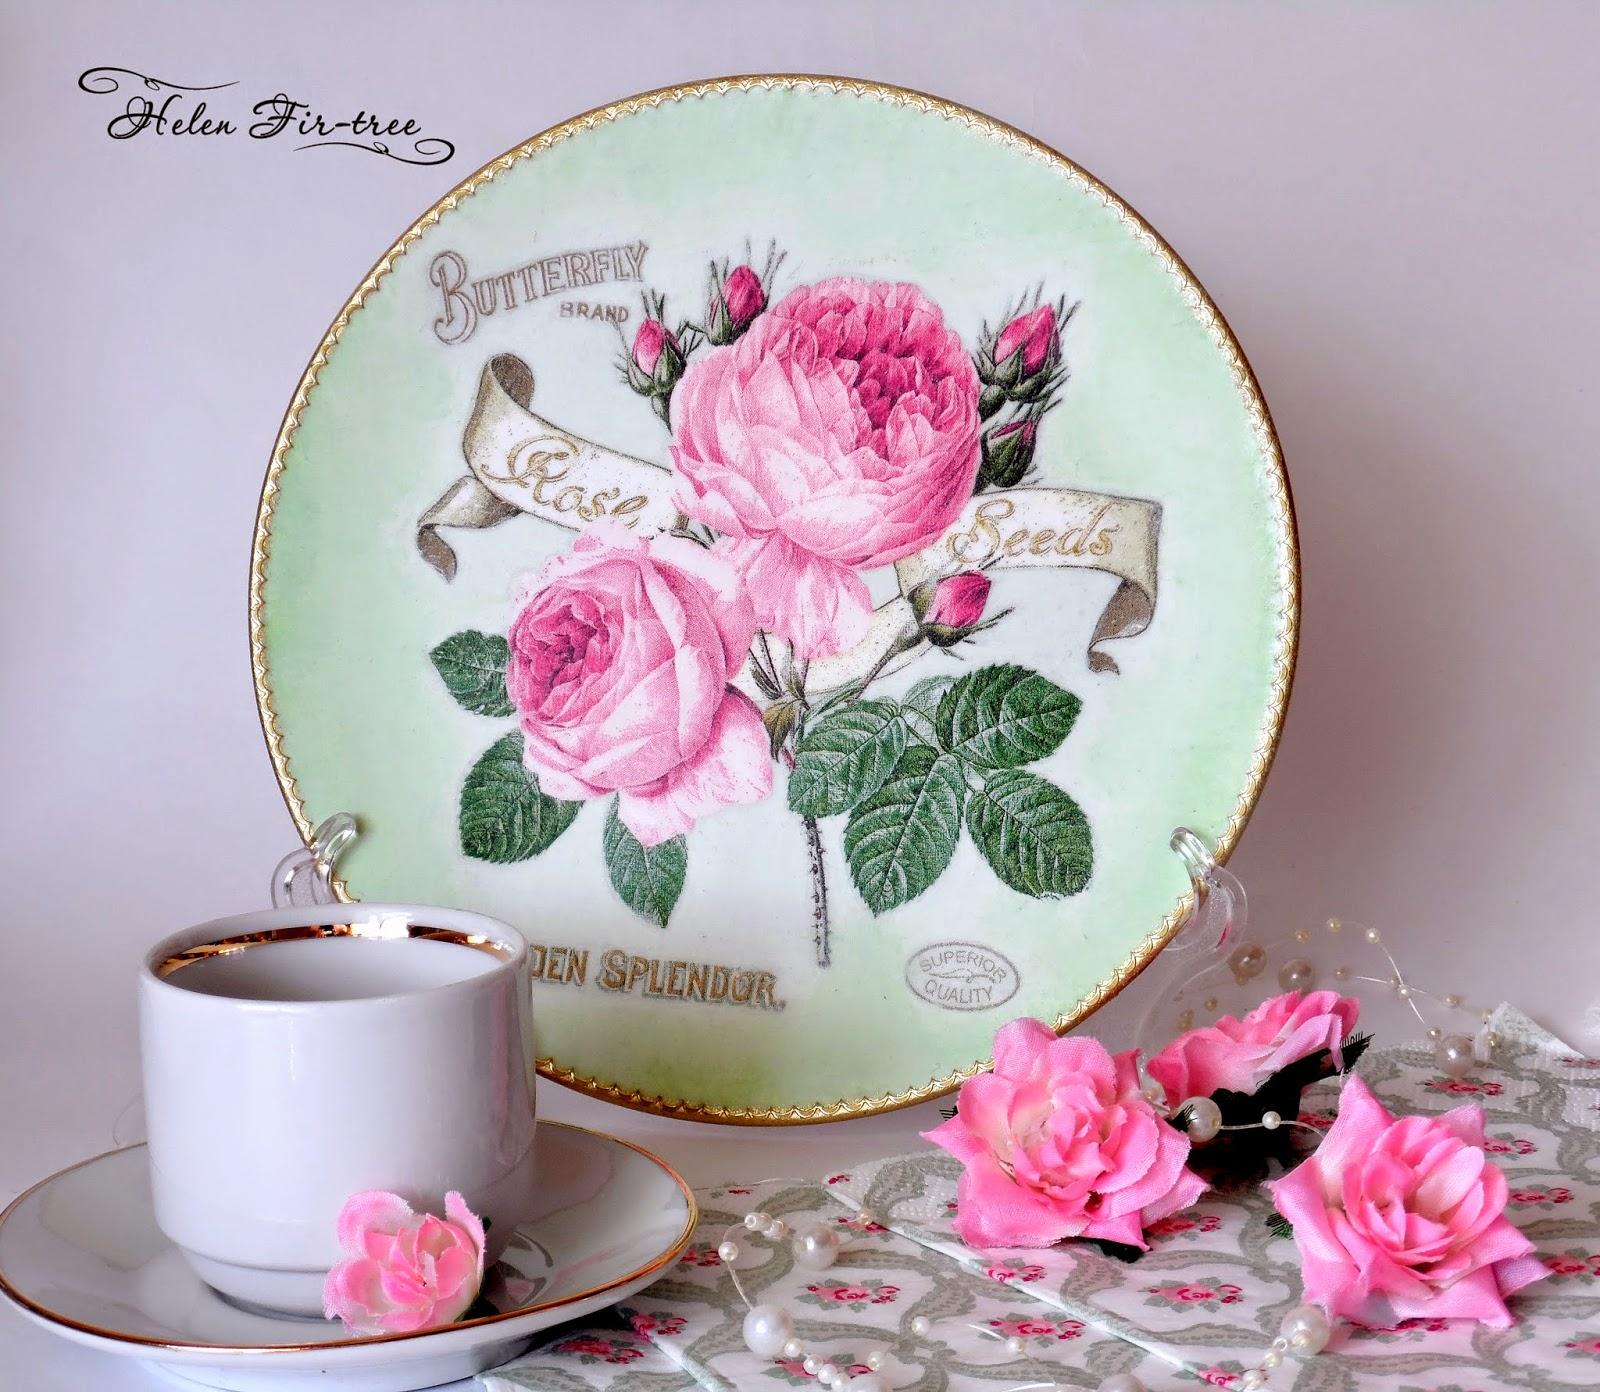 Helen Fir-tree декупаж тарелка Английская роза English rose decoupage plate